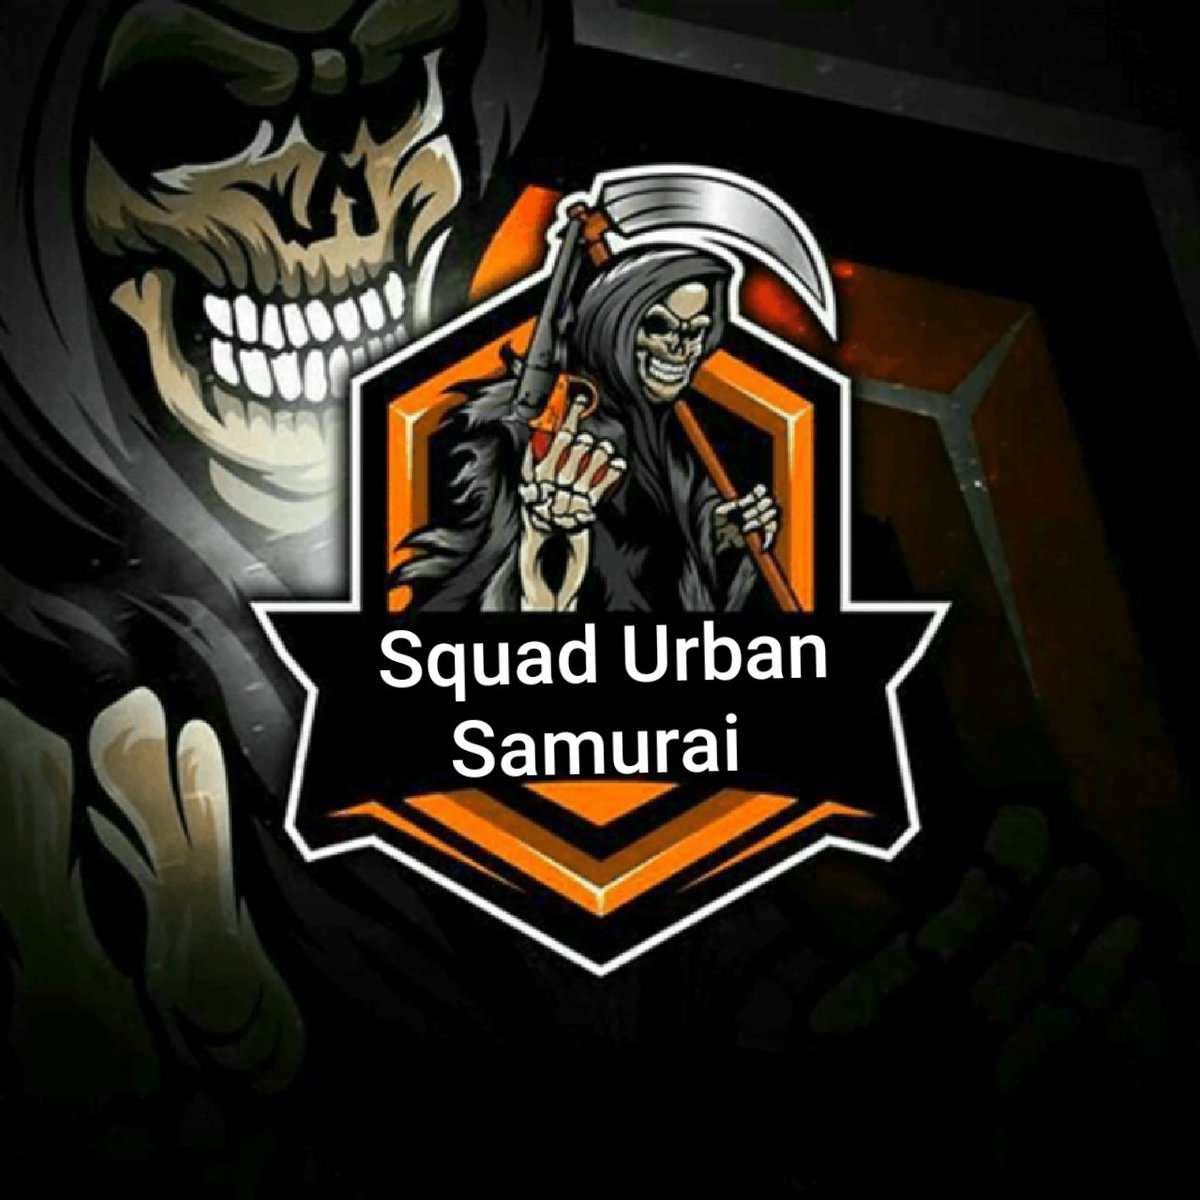 Squad Urban Samurai 065 Squadurbansamu1 Twitter